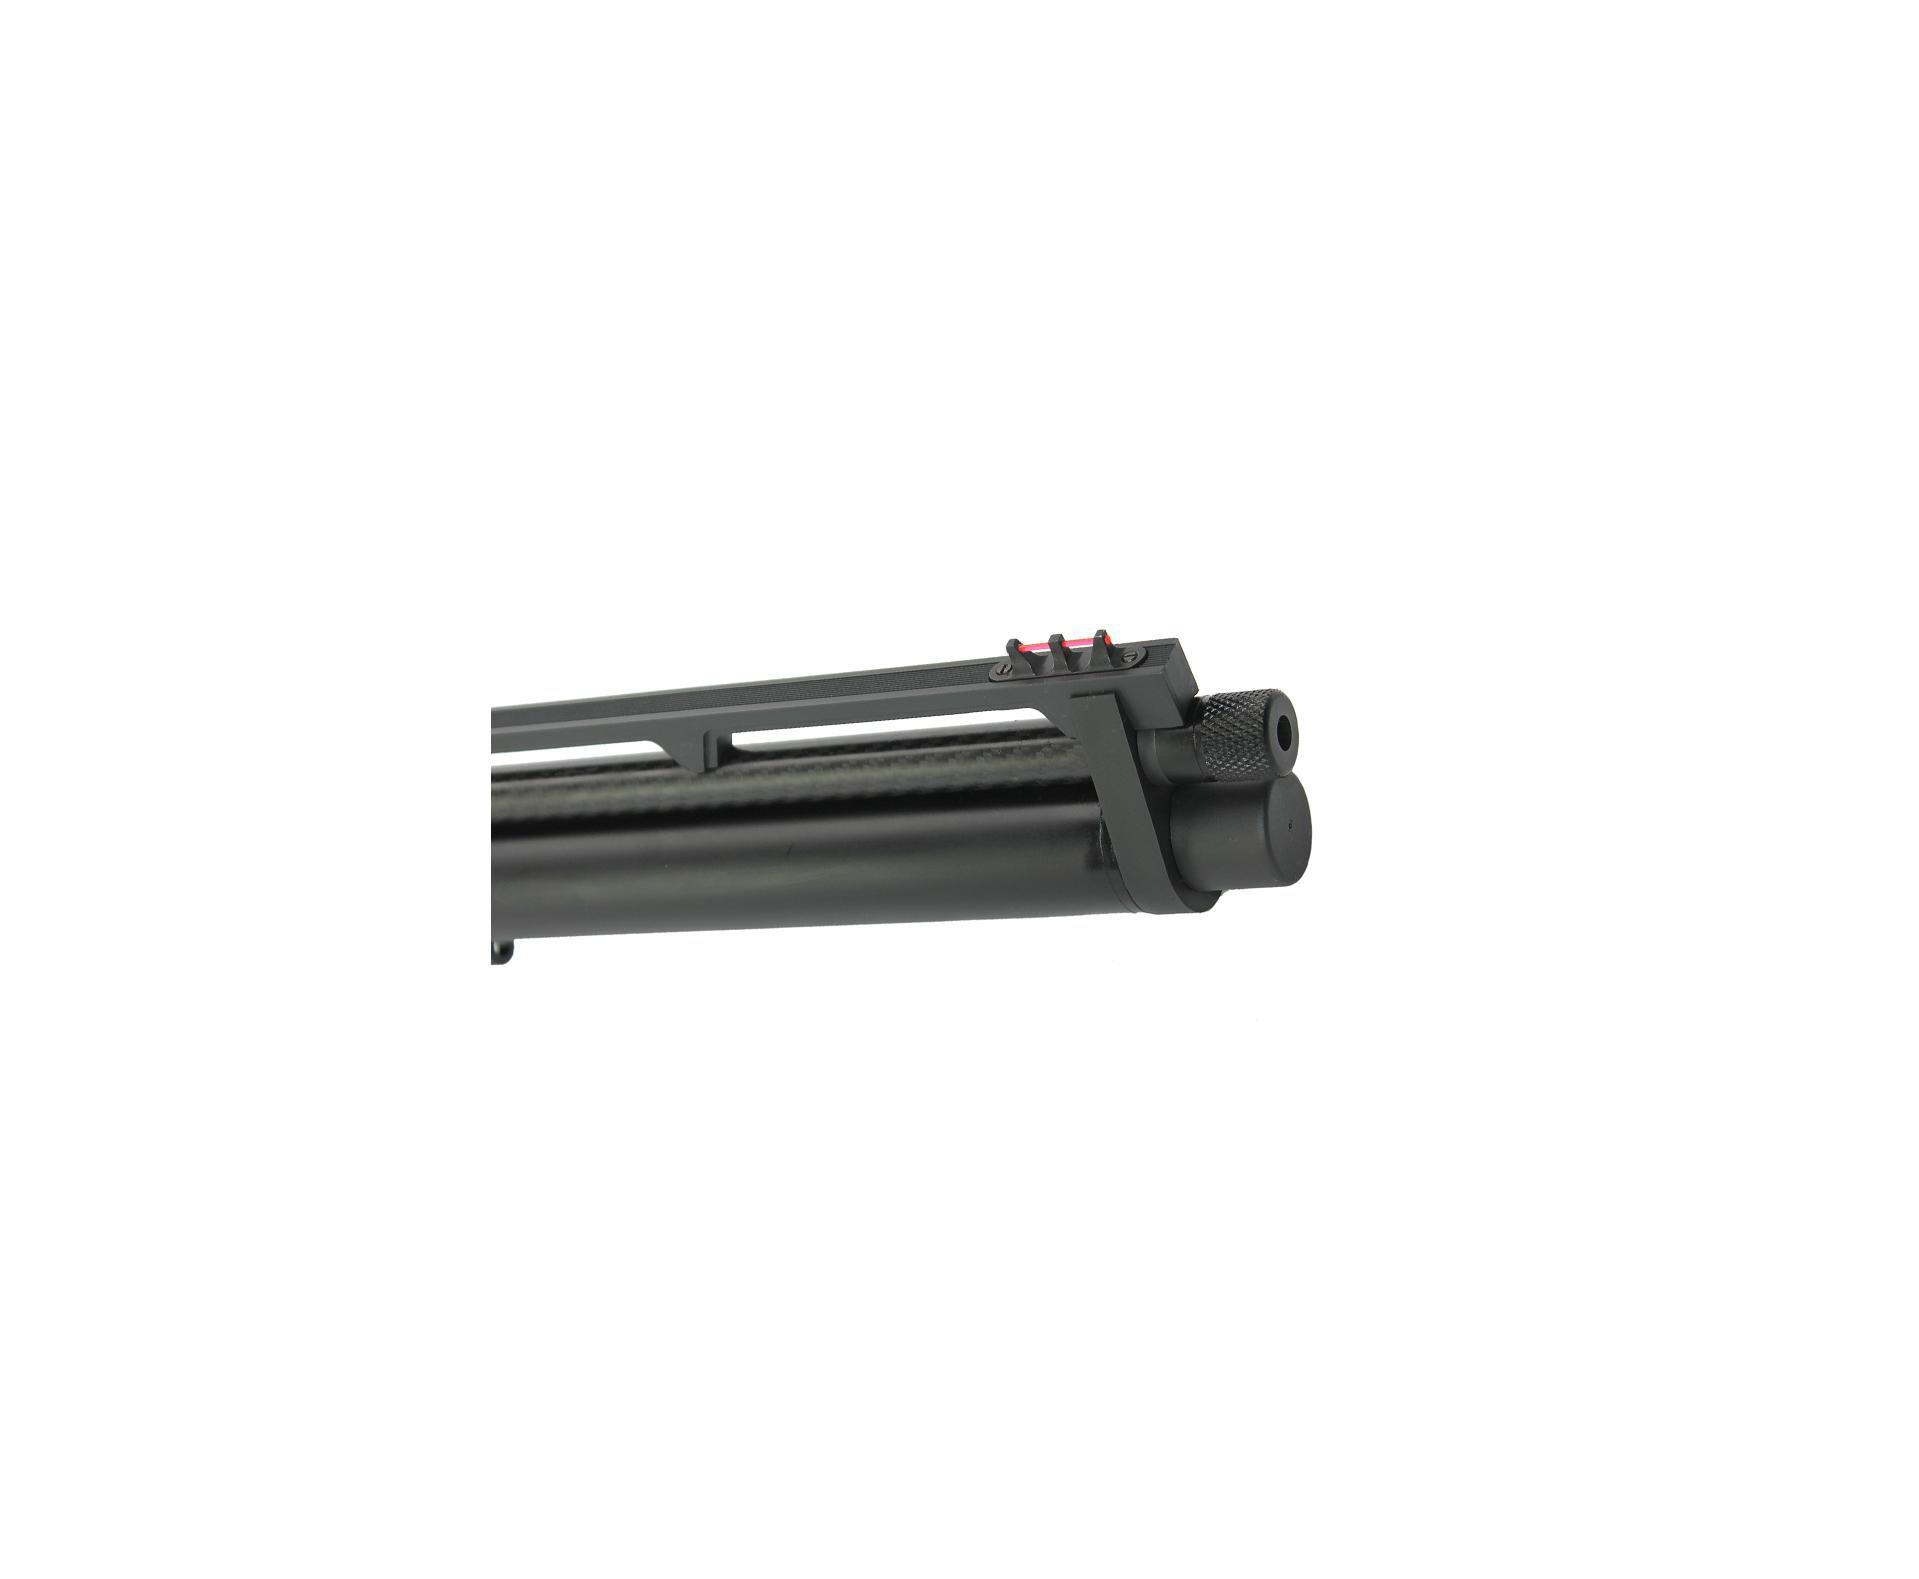 Carabina De Pressão Pcp Rossi R8 5,5mm 8 Tiros 350 M/S NEW G2 2021